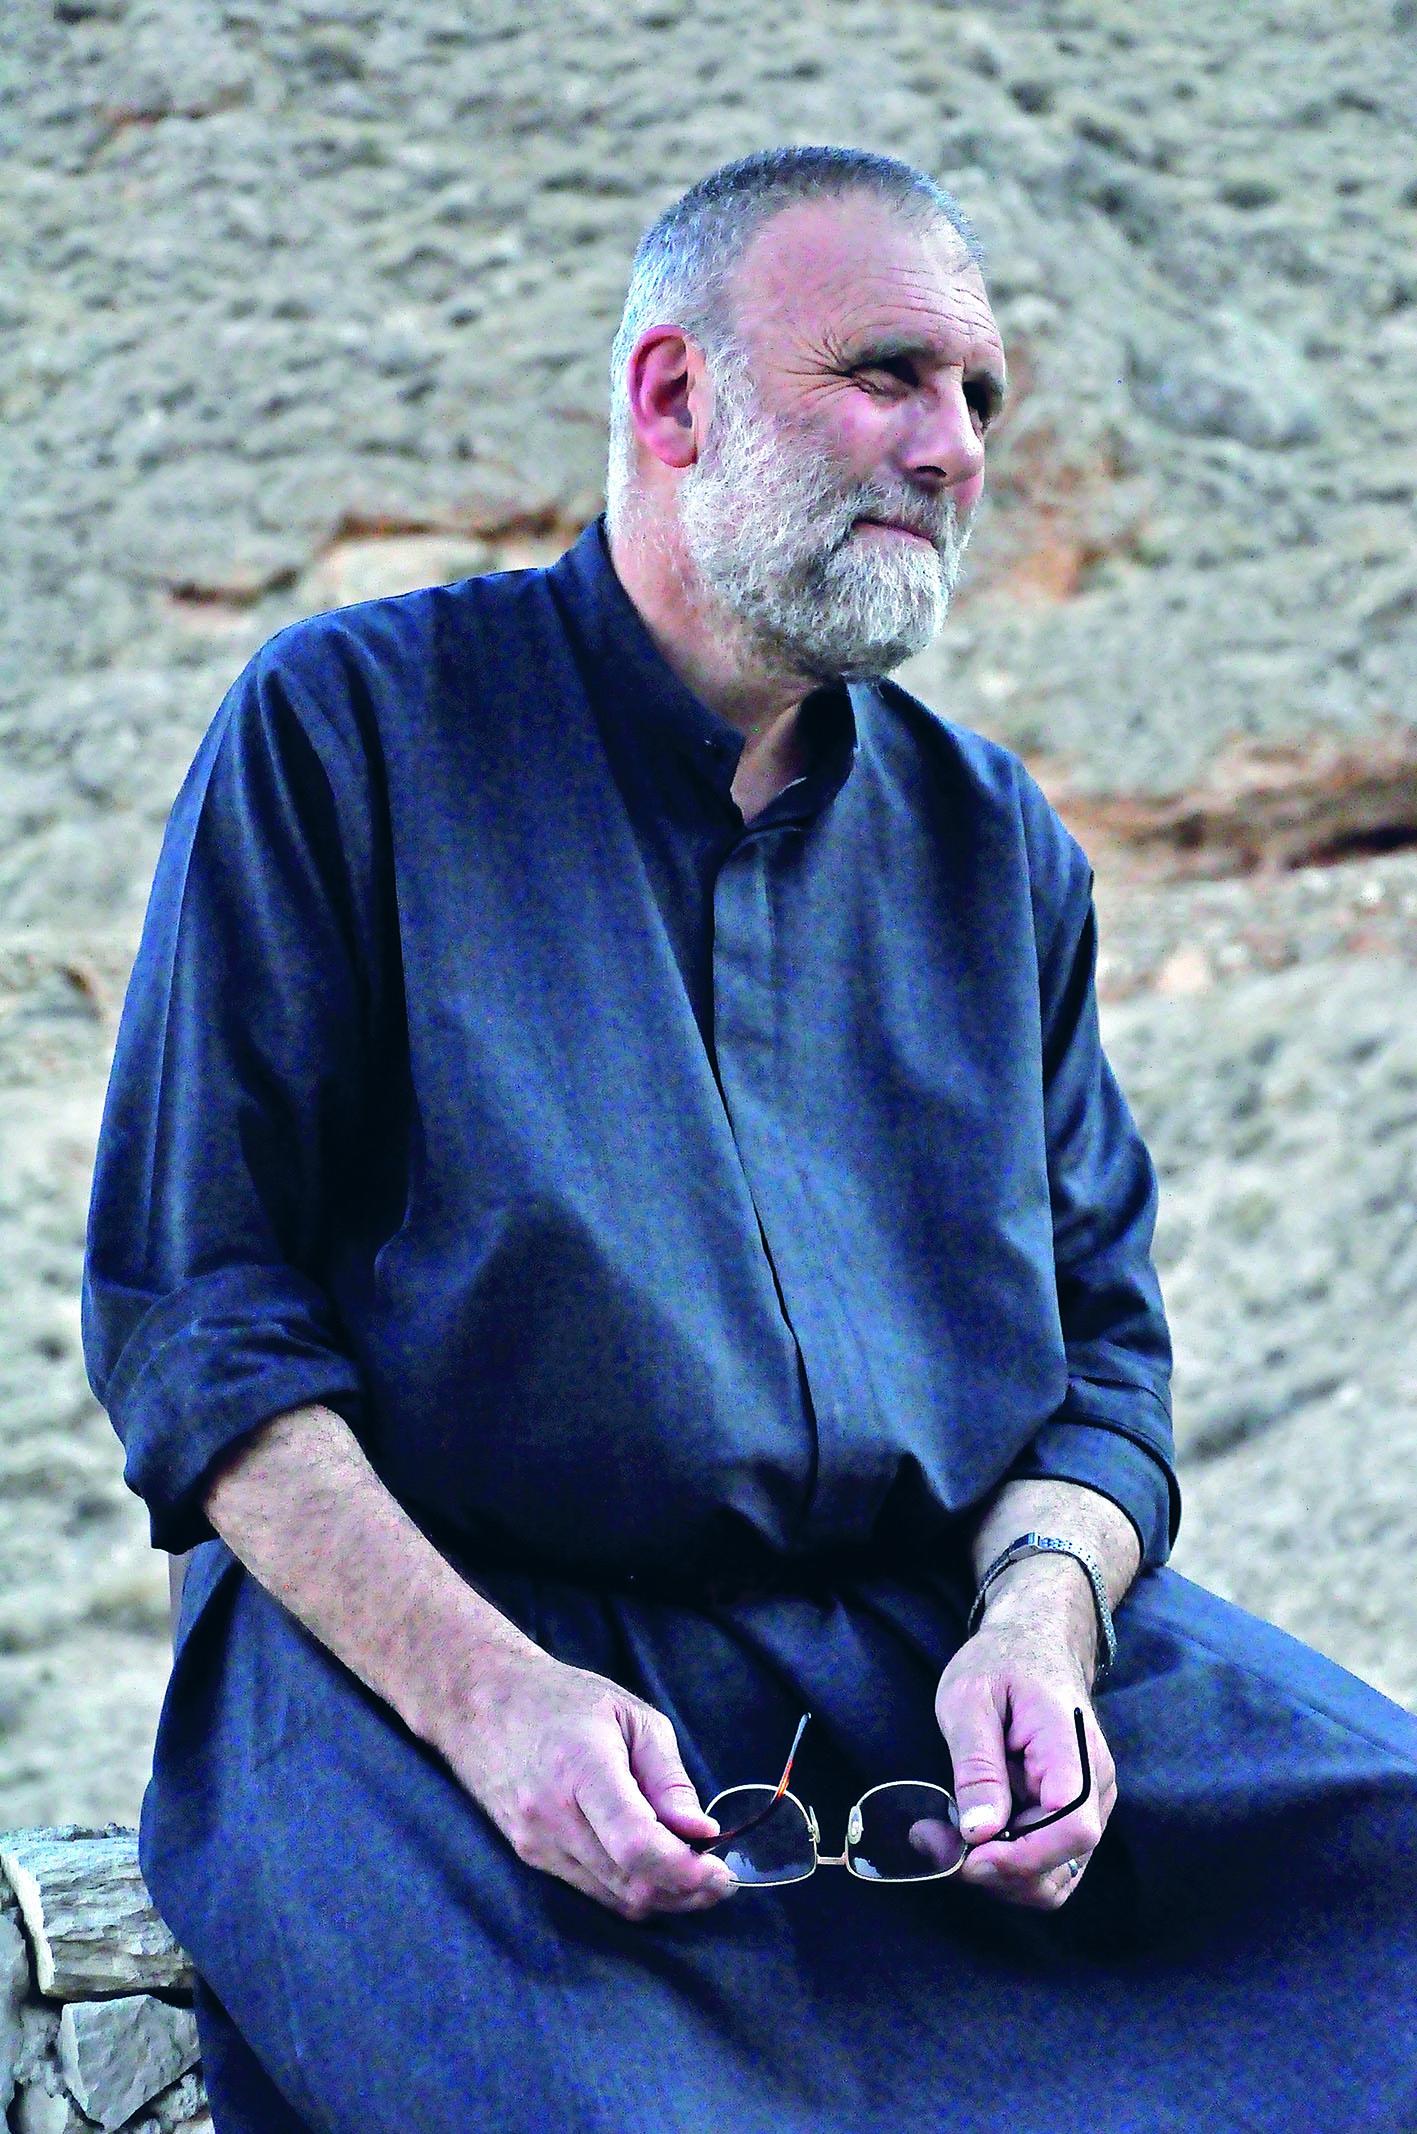 Paolo Dall'Oglio raakte in juli 2013 terwijl hij bemiddelde in Syrië. © G.Poulet